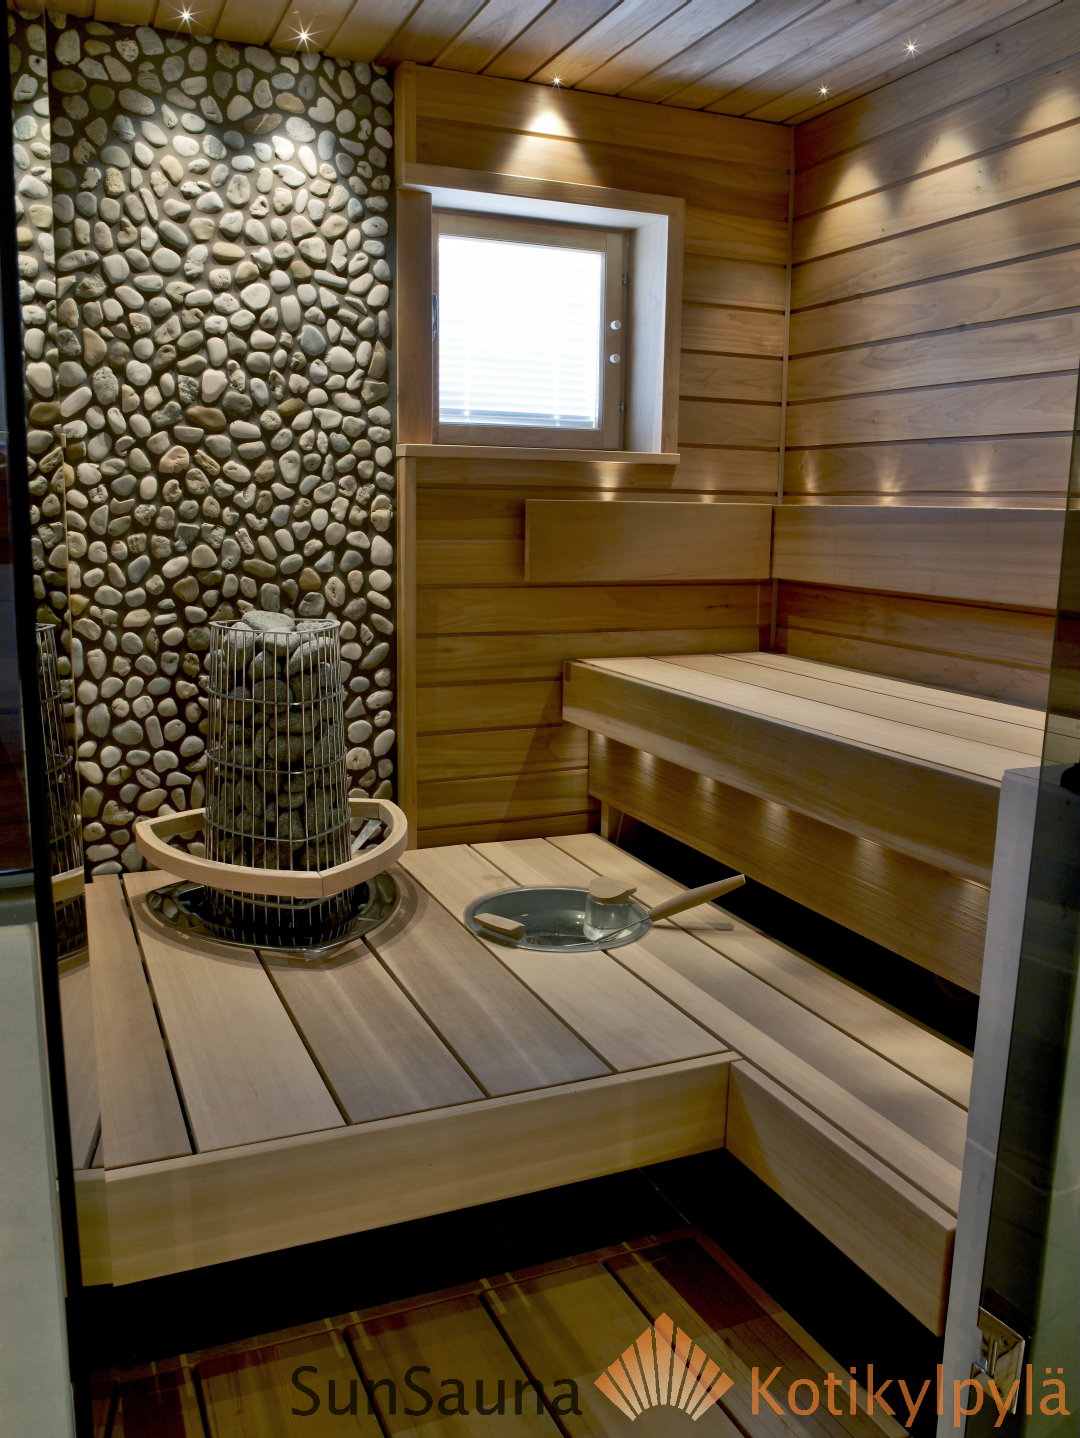 Sun Sauna Relax J Ttil Istuija Laude Red Cedar Bench